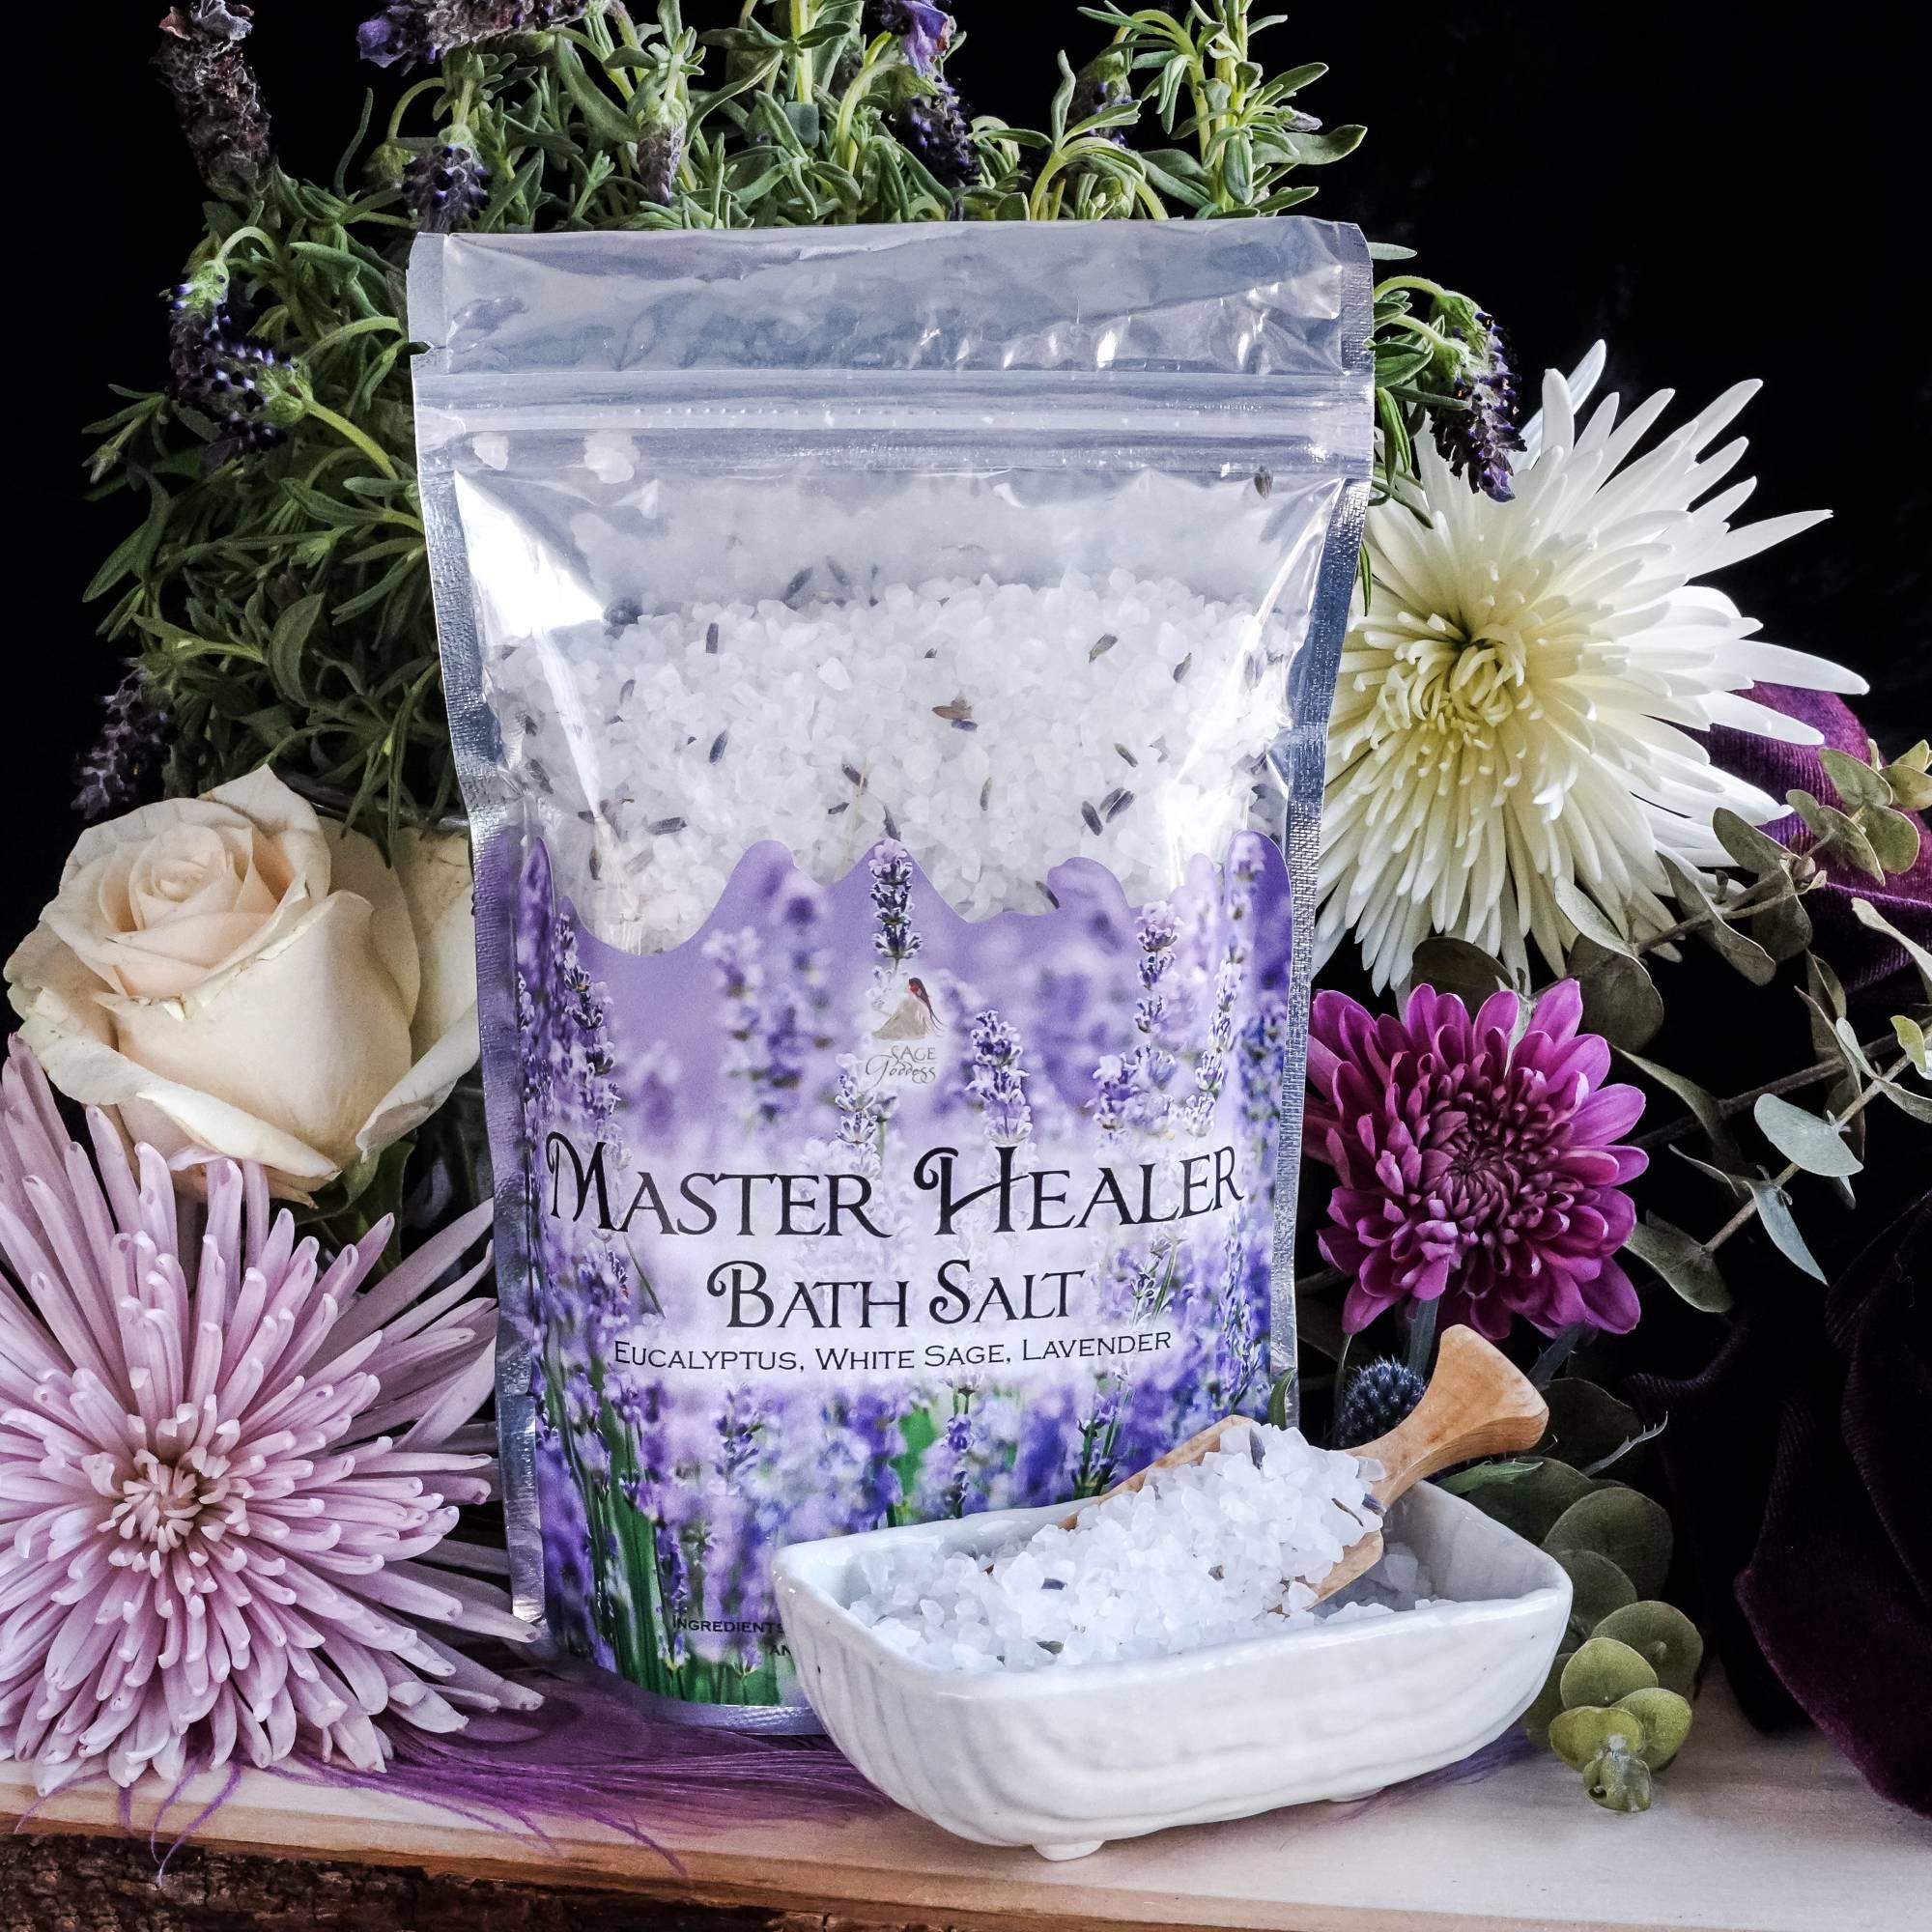 master healer bath salts